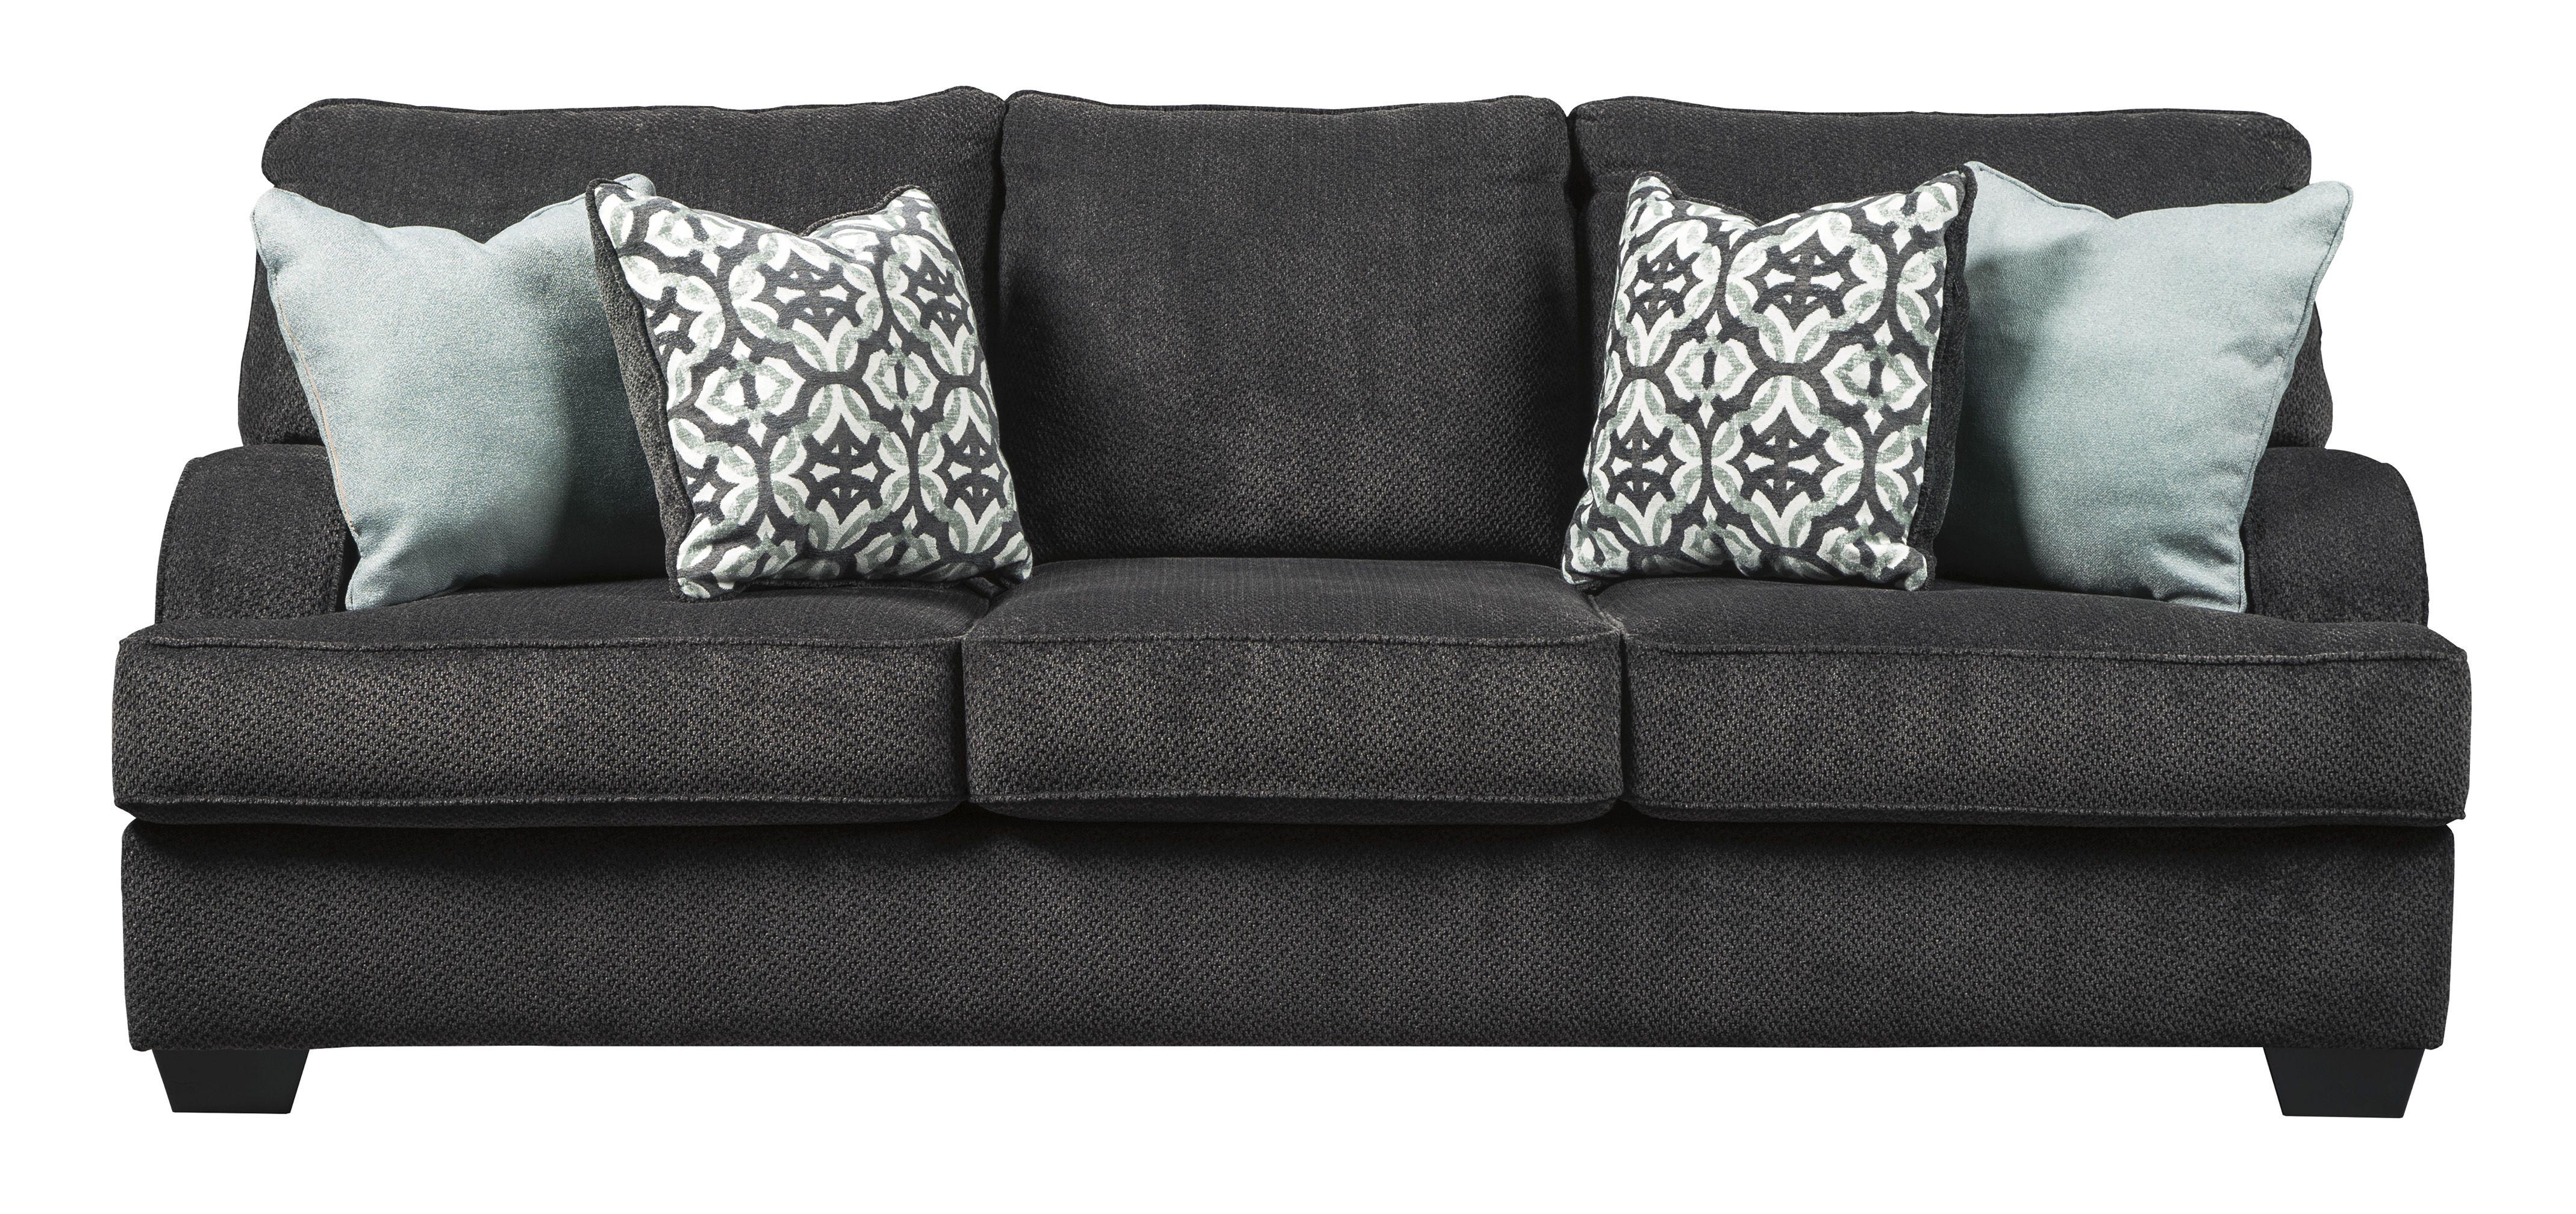 Best Sofa Charcoal Sofa Ashley Furniture Ashley Furniture Sofas 400 x 300